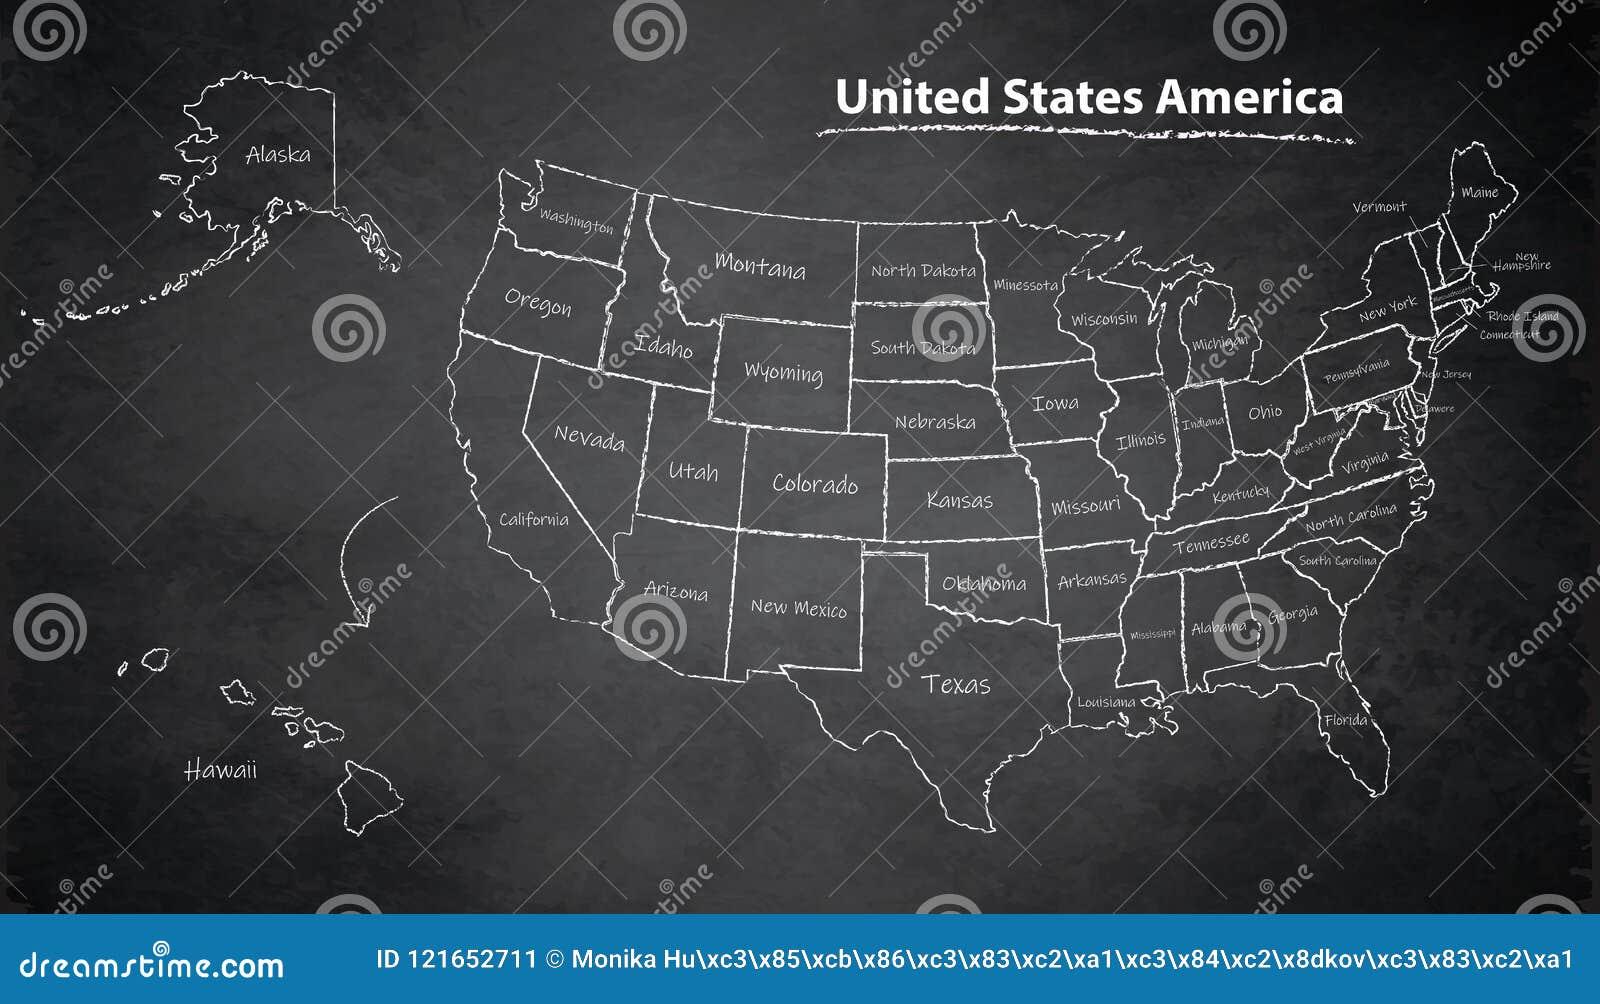 Usa Map With Alaska And Hawaii Map Separate Individual Blackboard